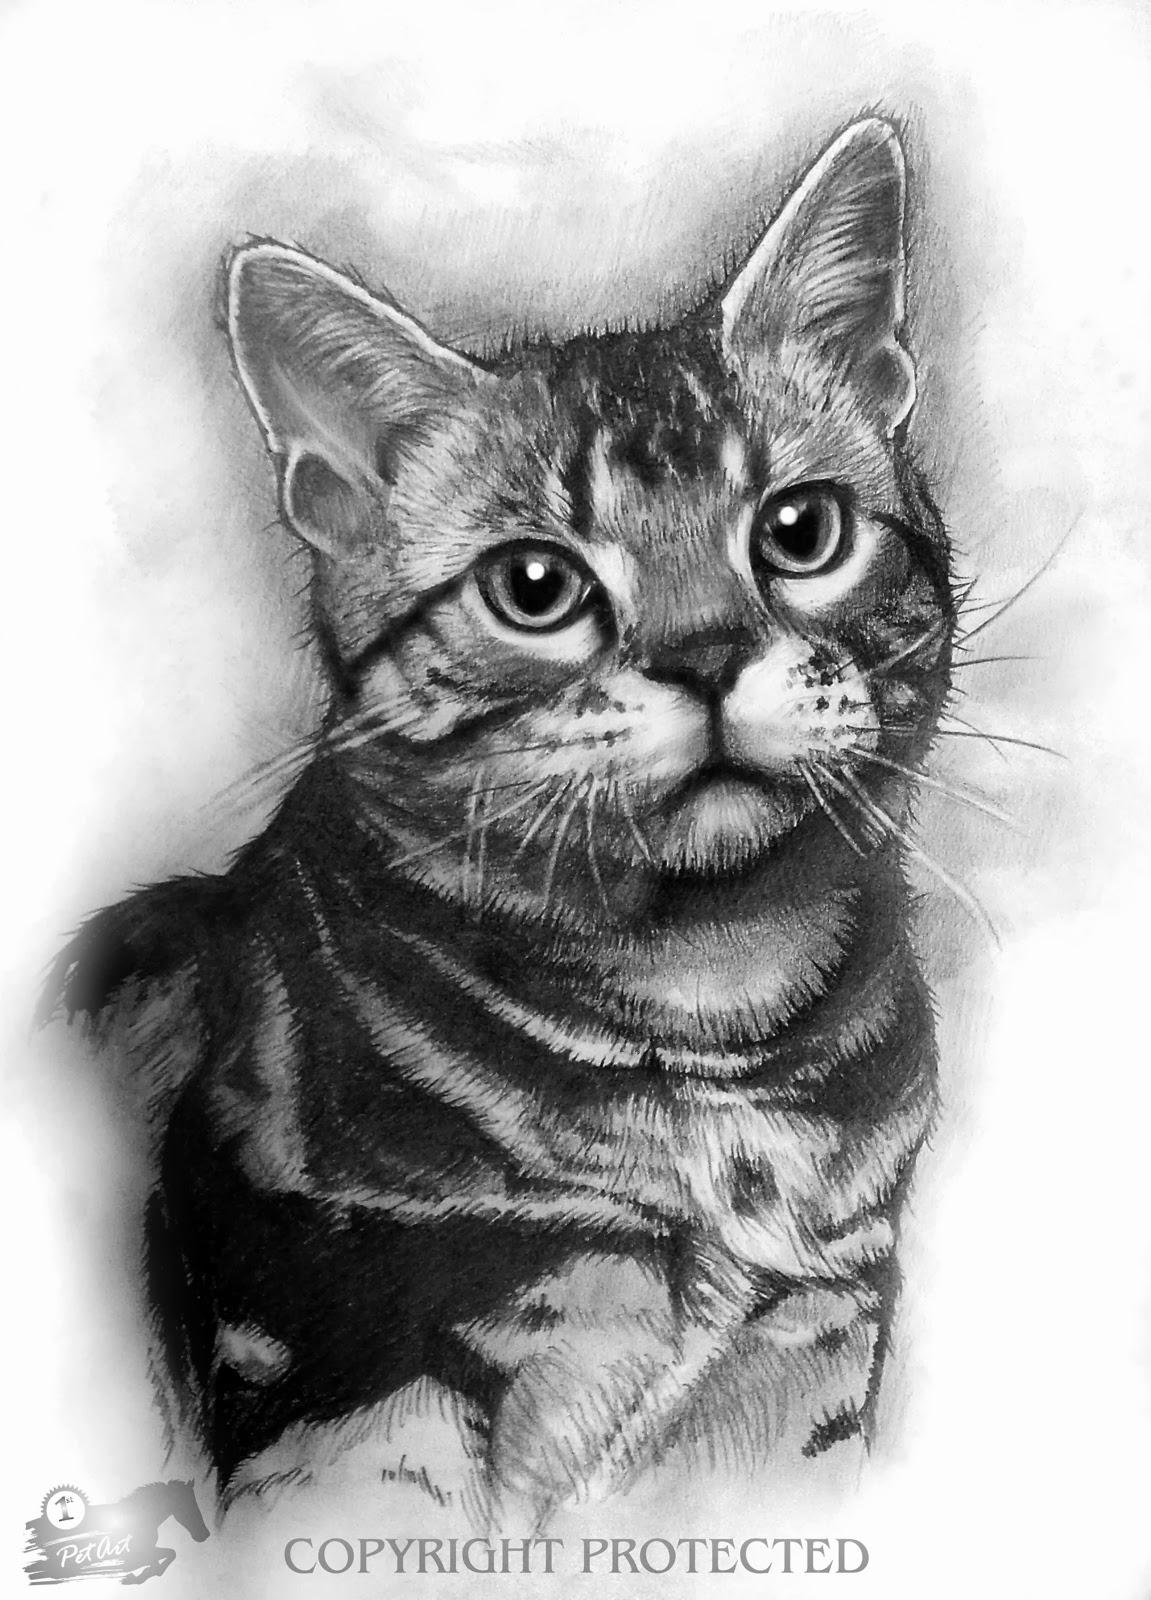 Realistic Animal Drawings: November 2013